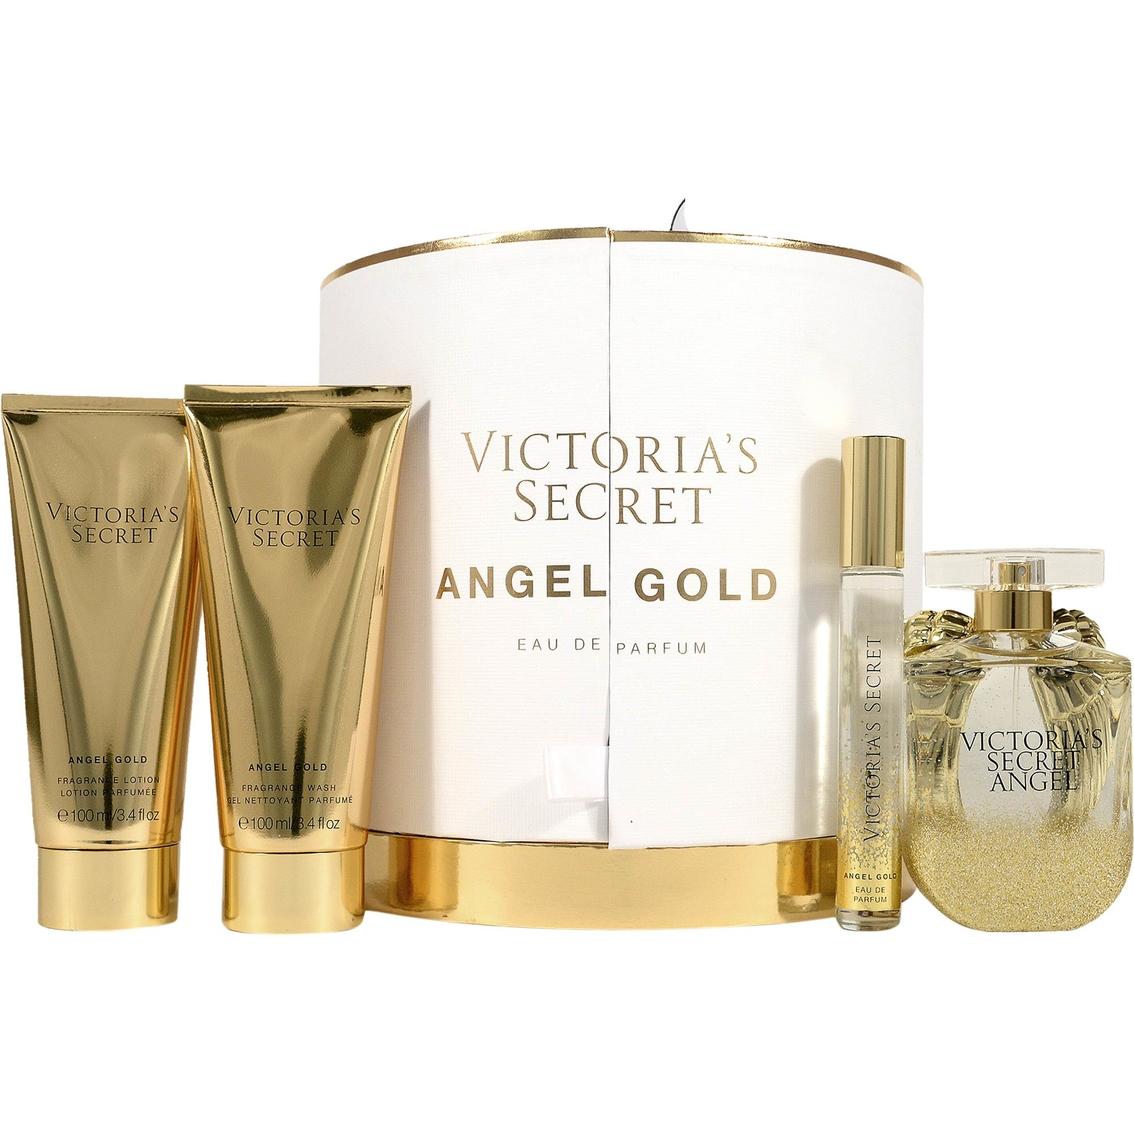 Medium BoxWomen's Gold Fragrance Victoria's Secret Angel OXuiTkZP